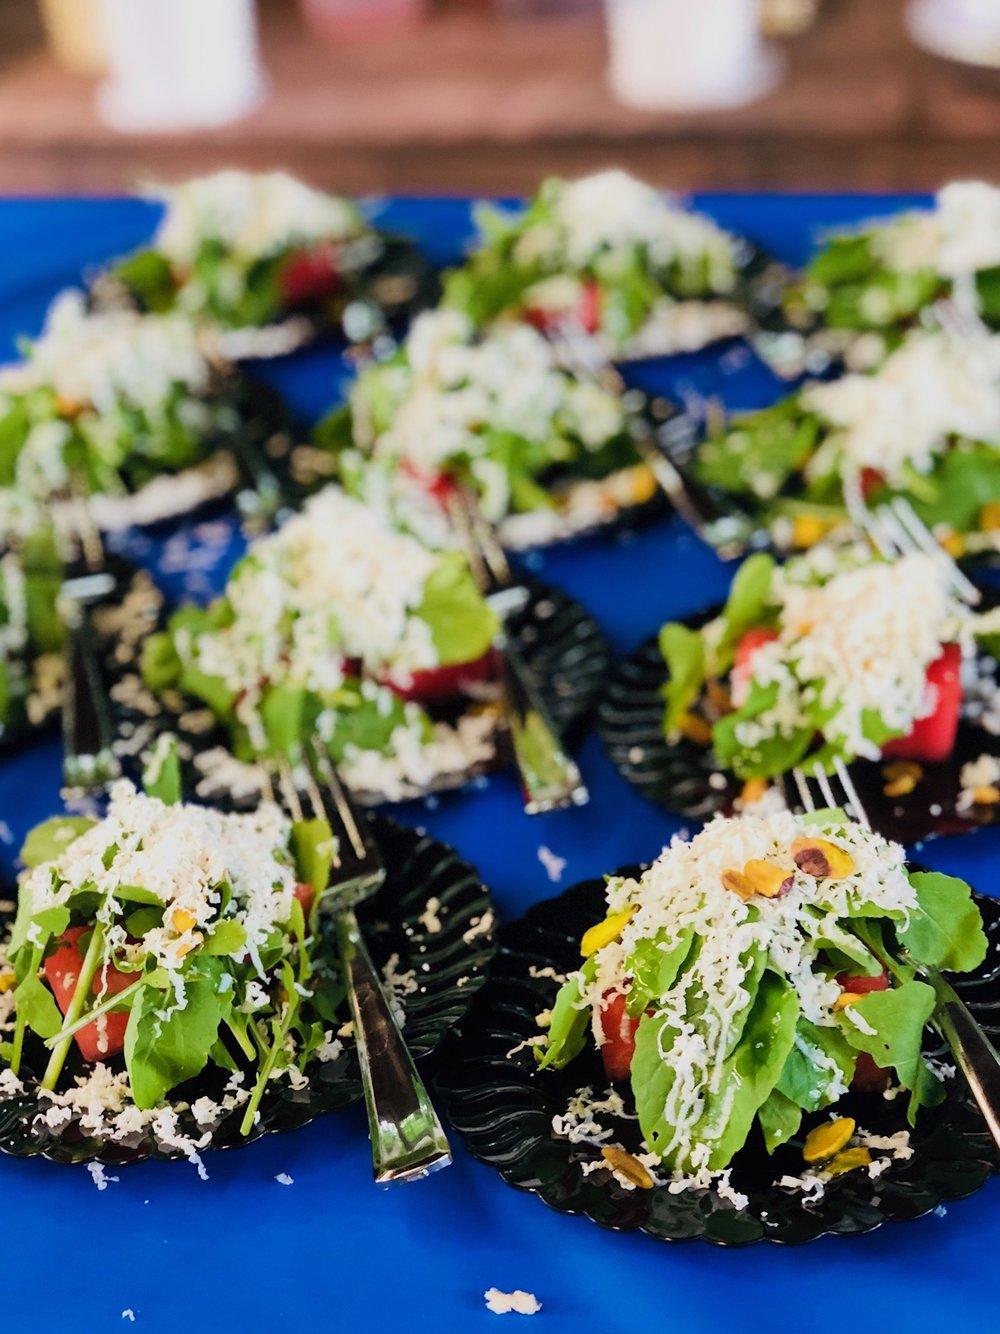 Watermelon Salad - with Arugula, Pistachio, Ricotta Salata, Pink Peppercorn